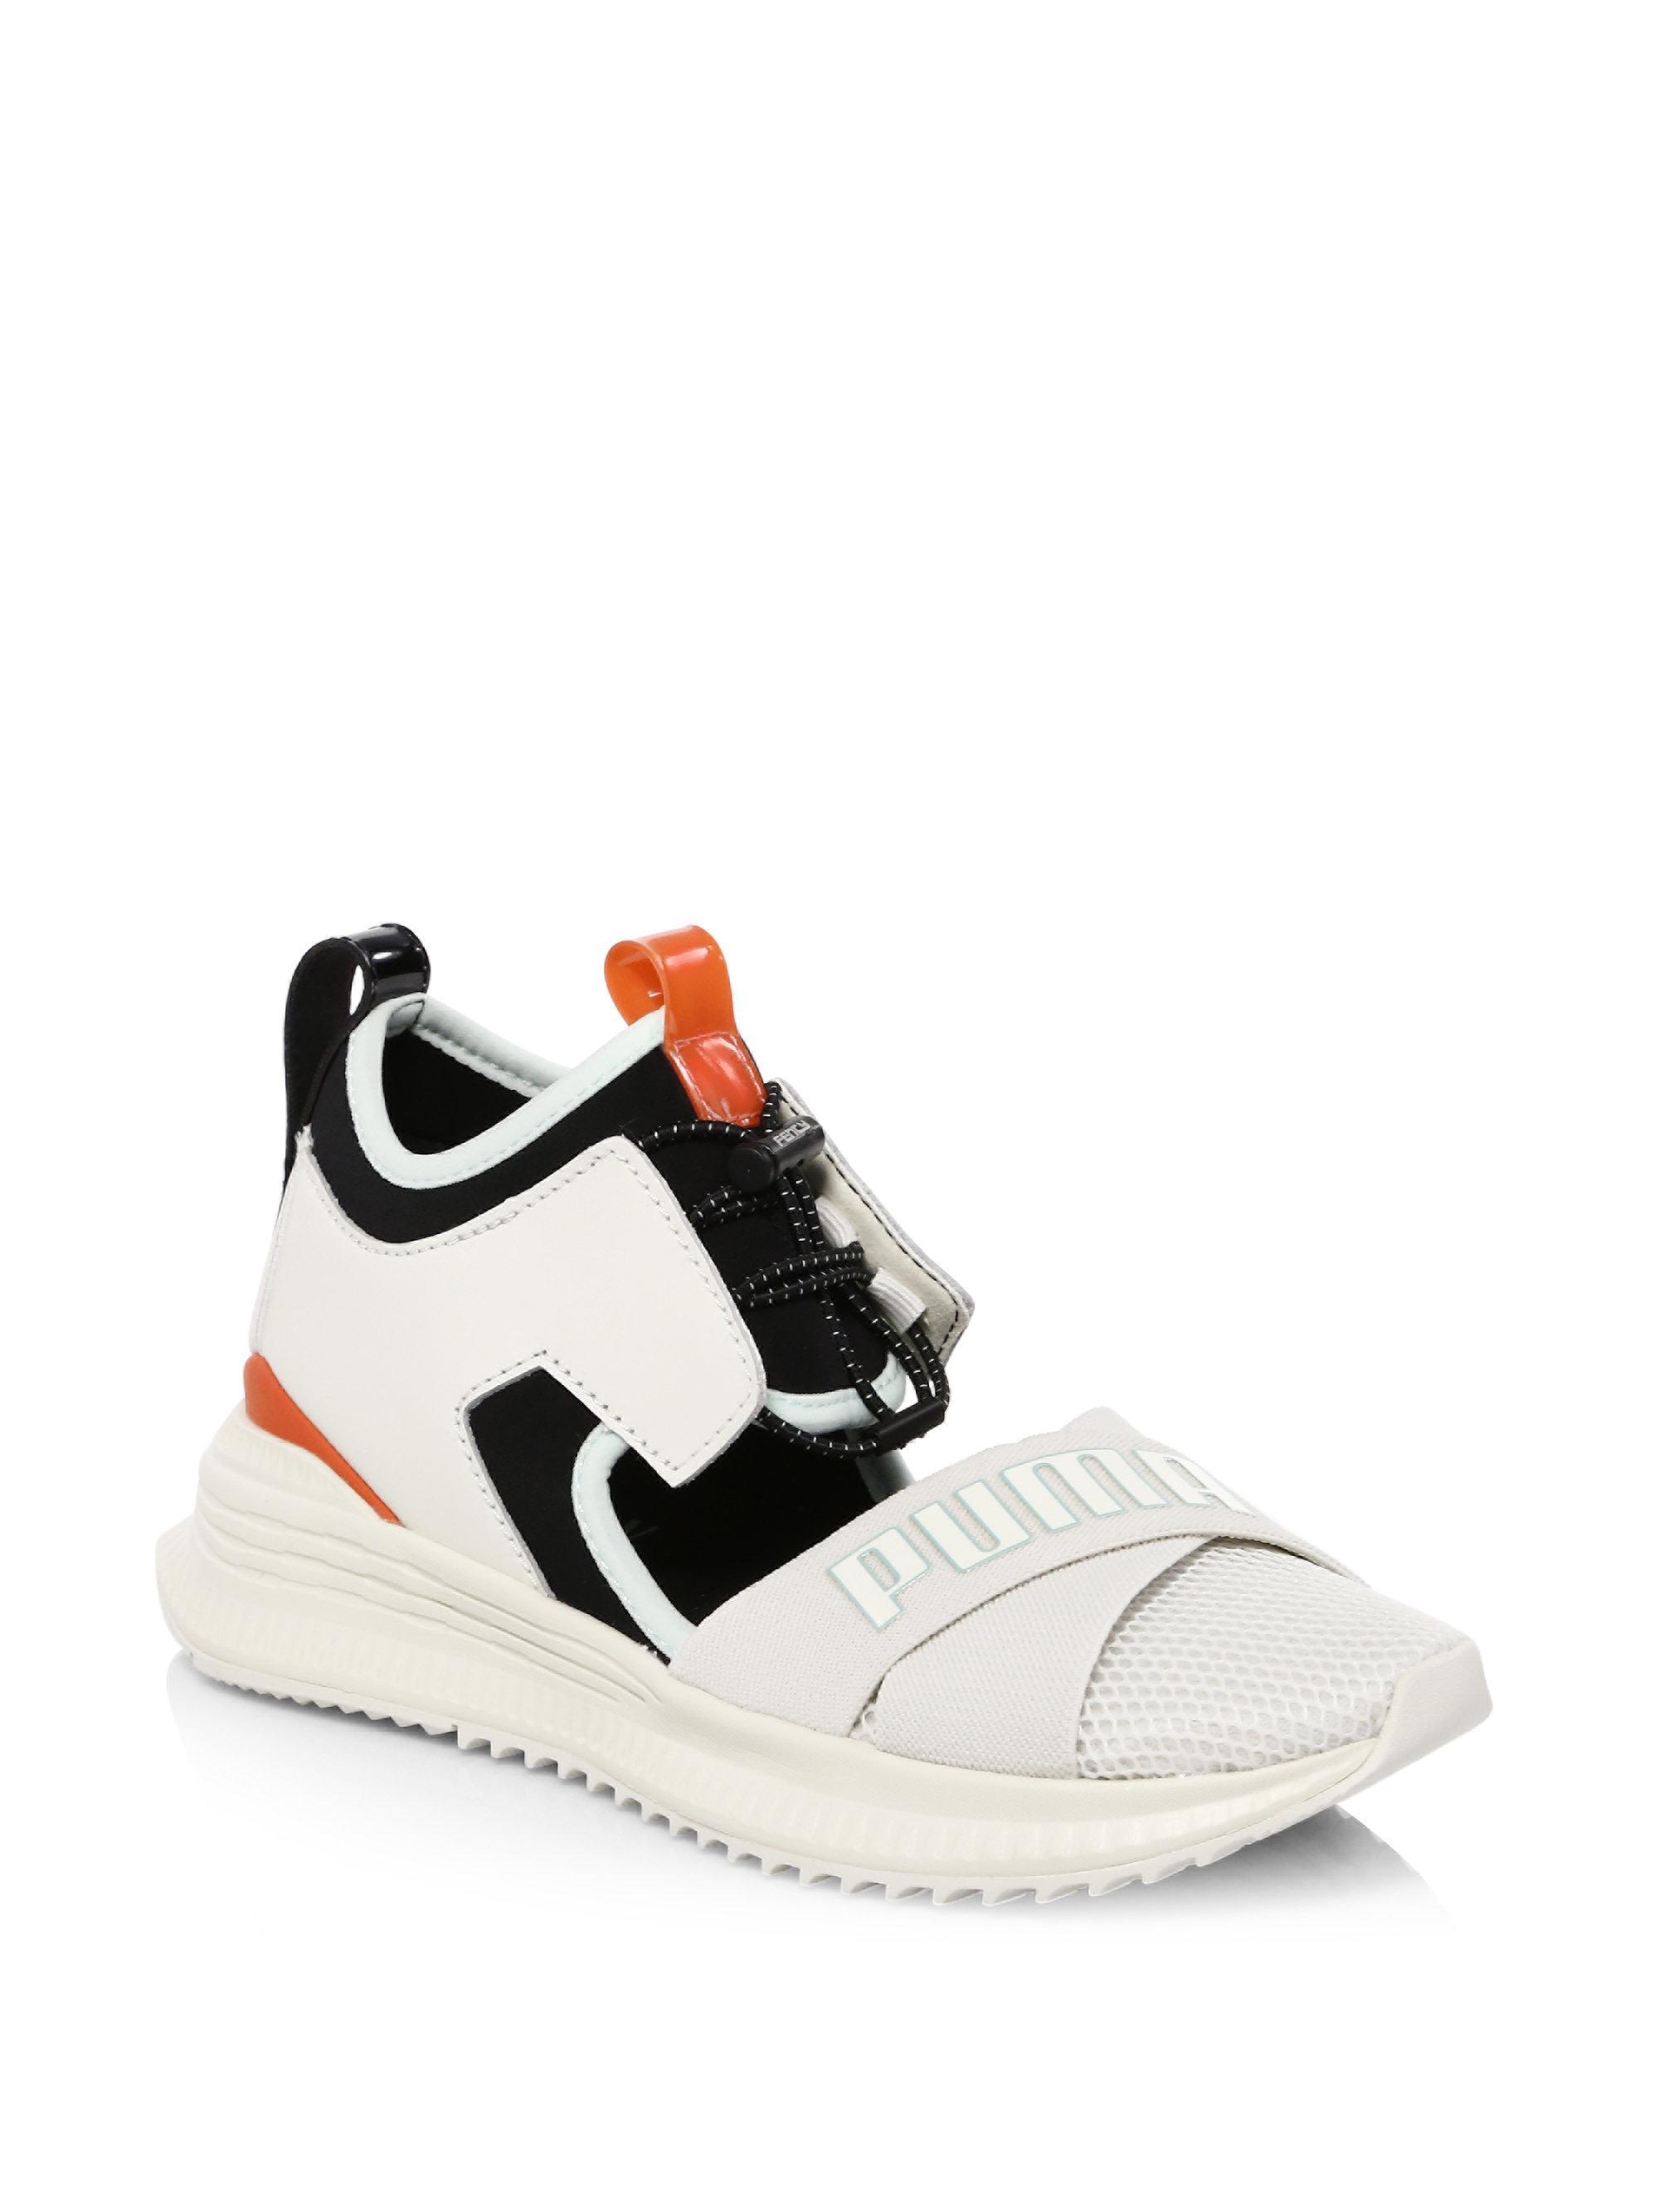 Puma Fenty cutout sneakers LxAYWnt